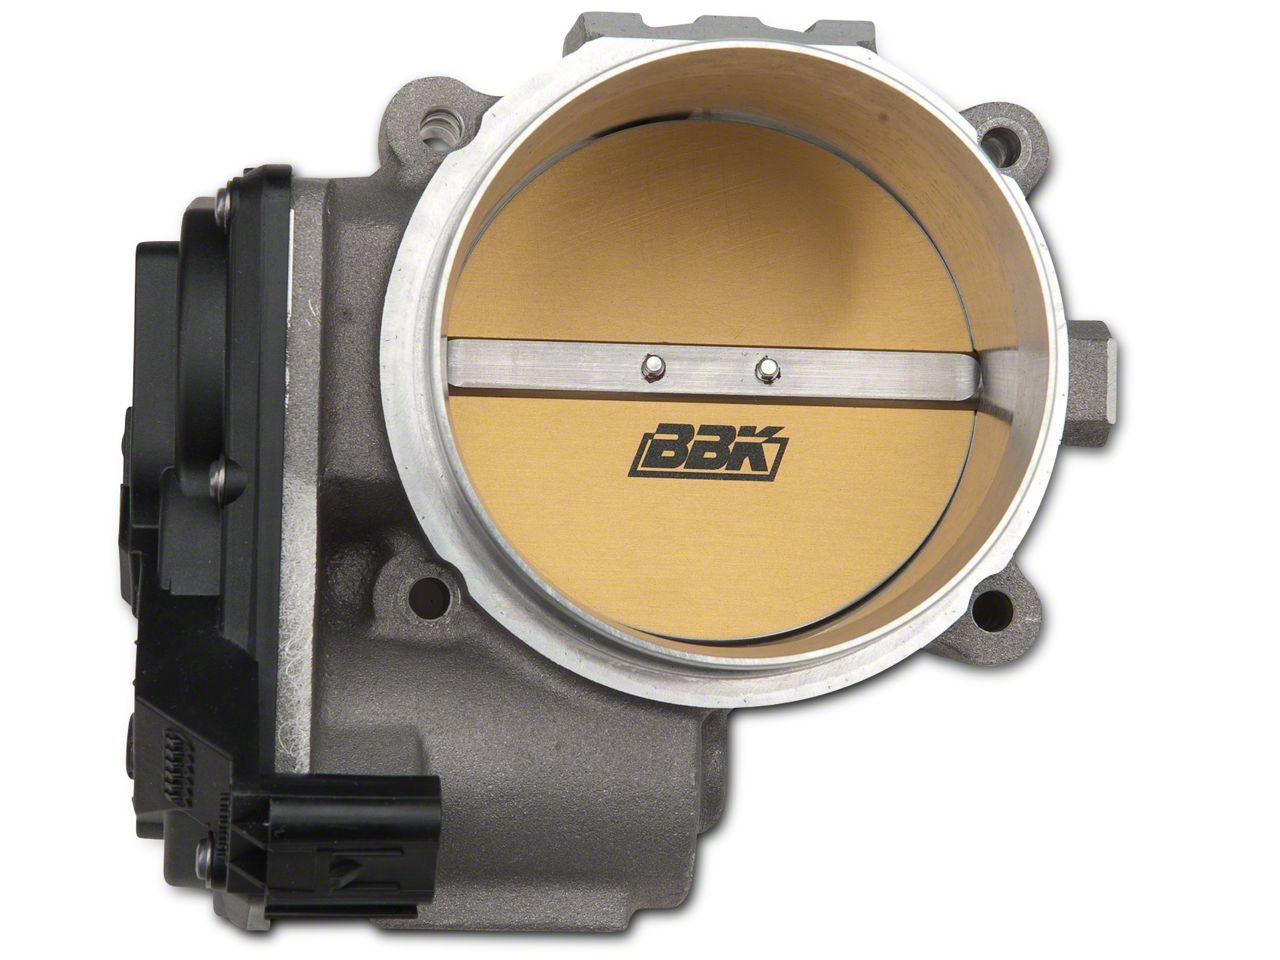 BBK 85mm Throttle Body (11-14 5.0L F-150)